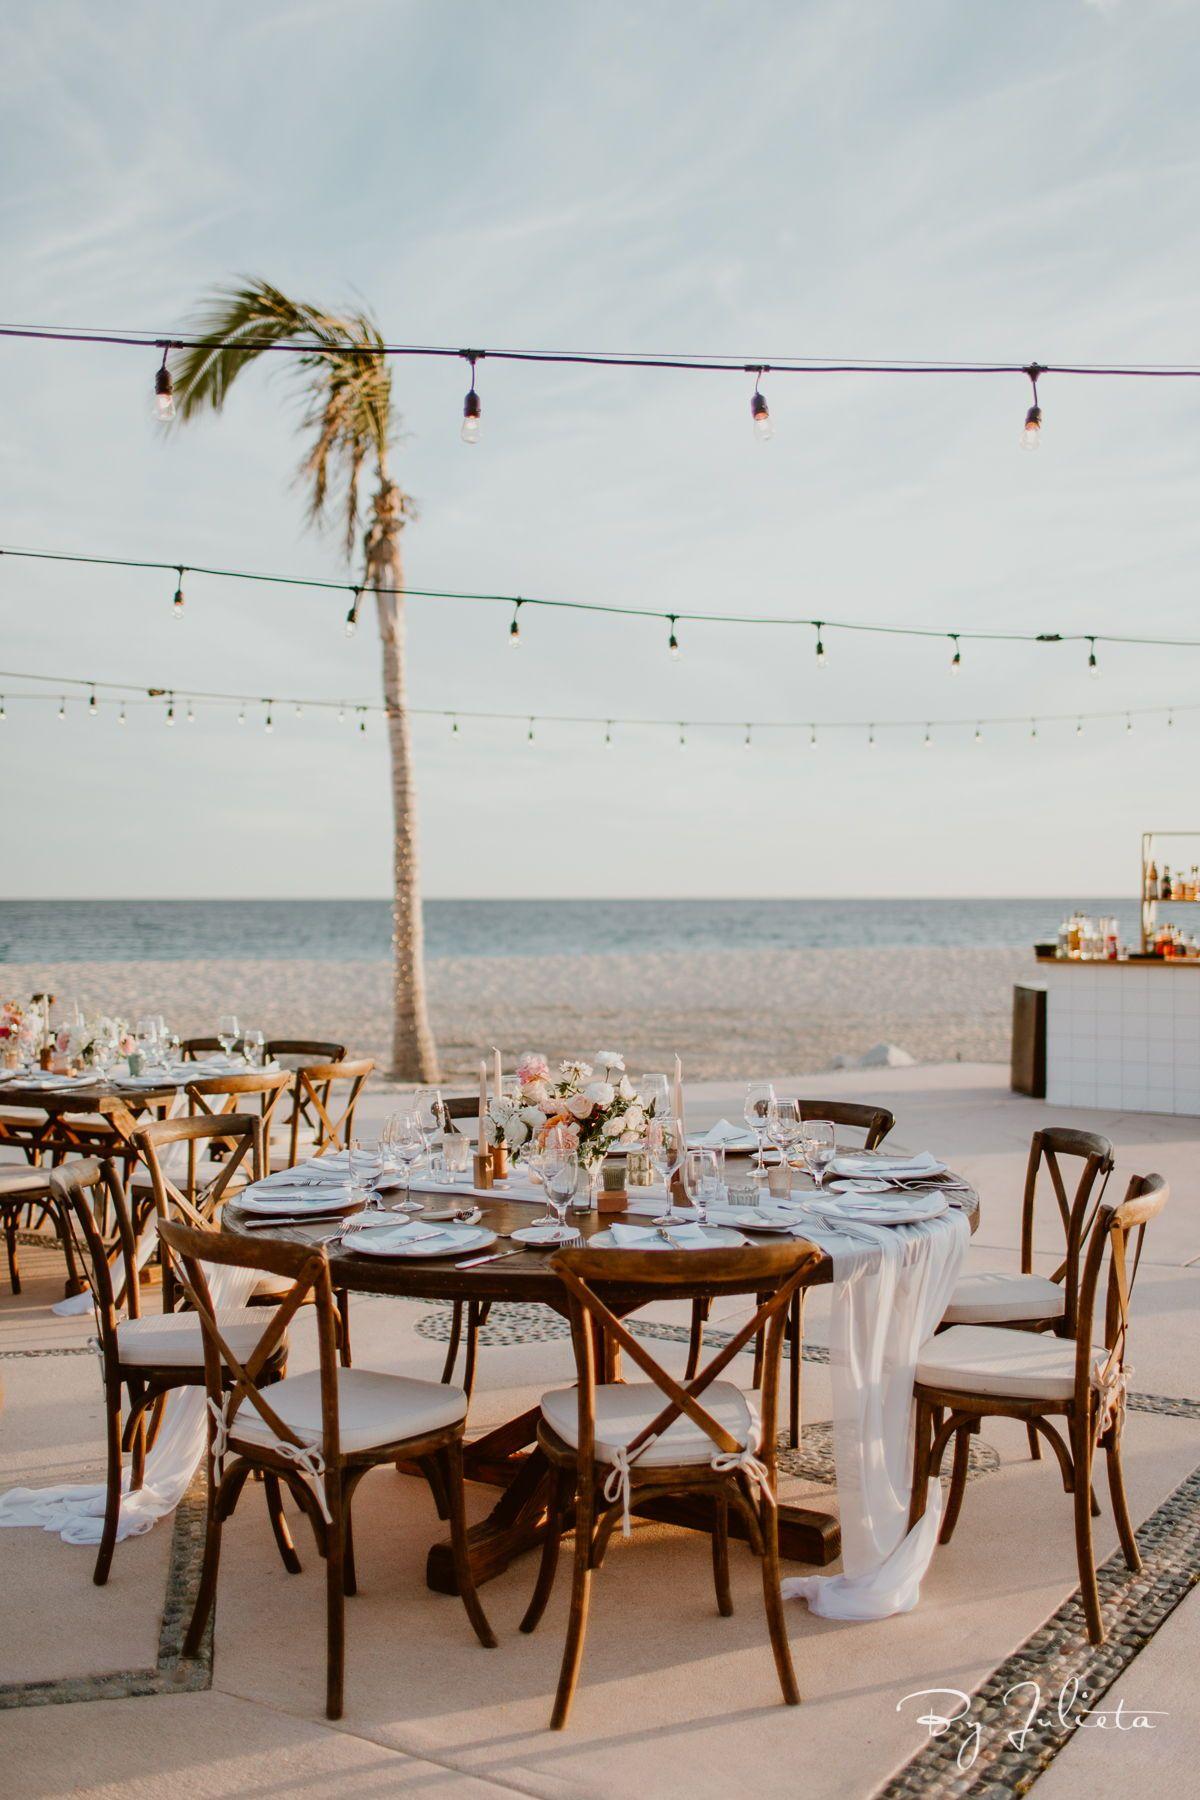 Christina Ted Cabo Wedding Casa Del Mar Wedding Beach Wedding Destination Beach Wedding Ceremony Sunset Beach Weddings Los Cabos Wedding Cabo Weddings